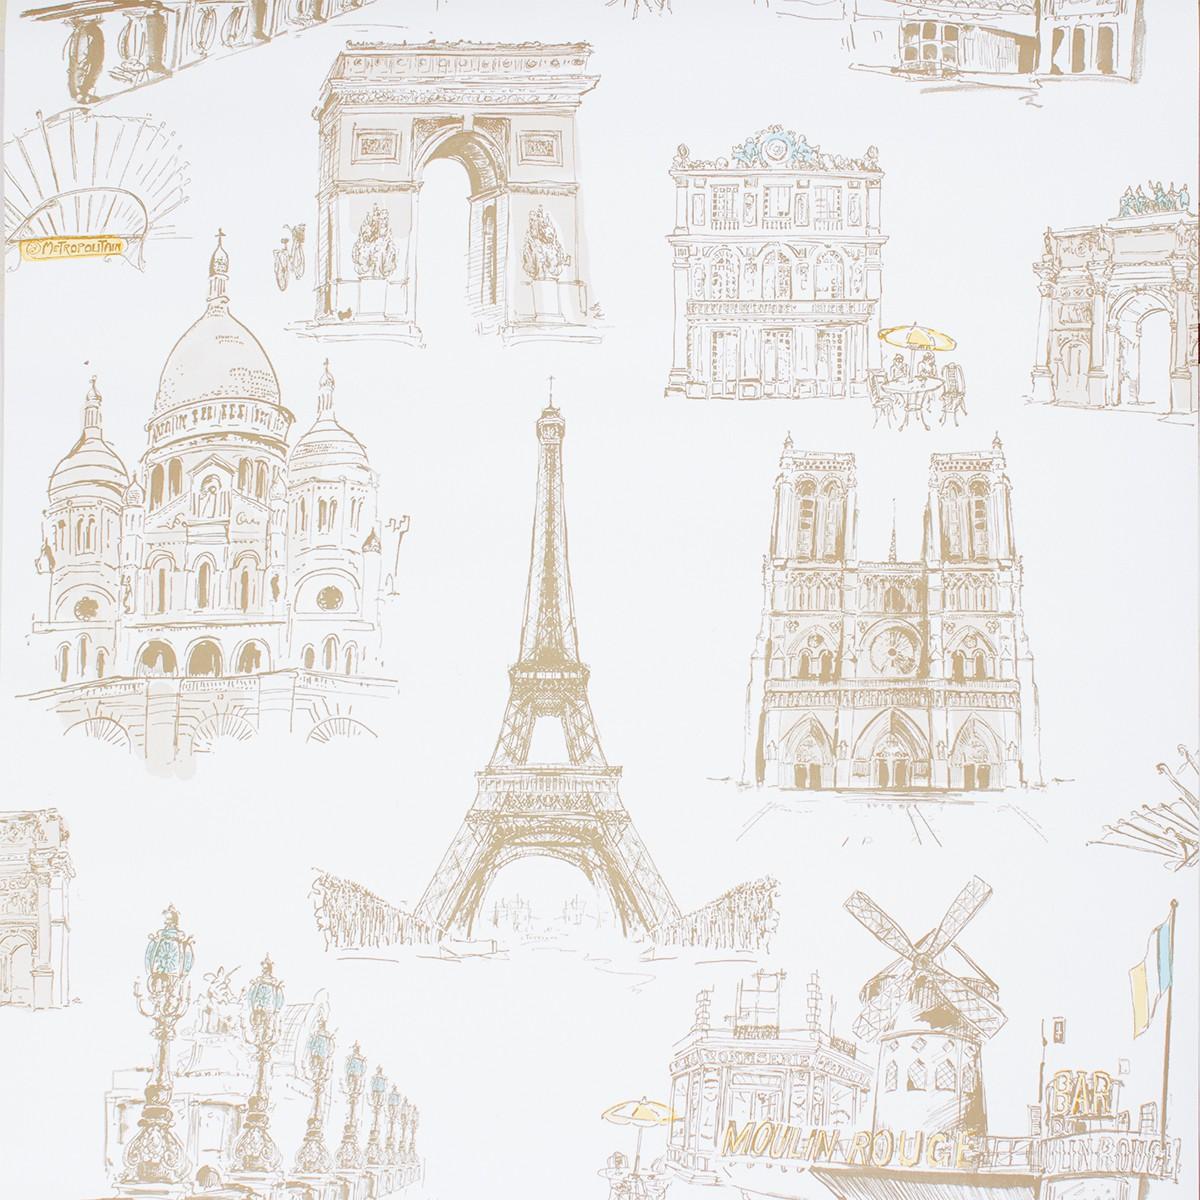 Tapete Cremeweiss Beige Stadt Paris Eifelturm Ideco Home